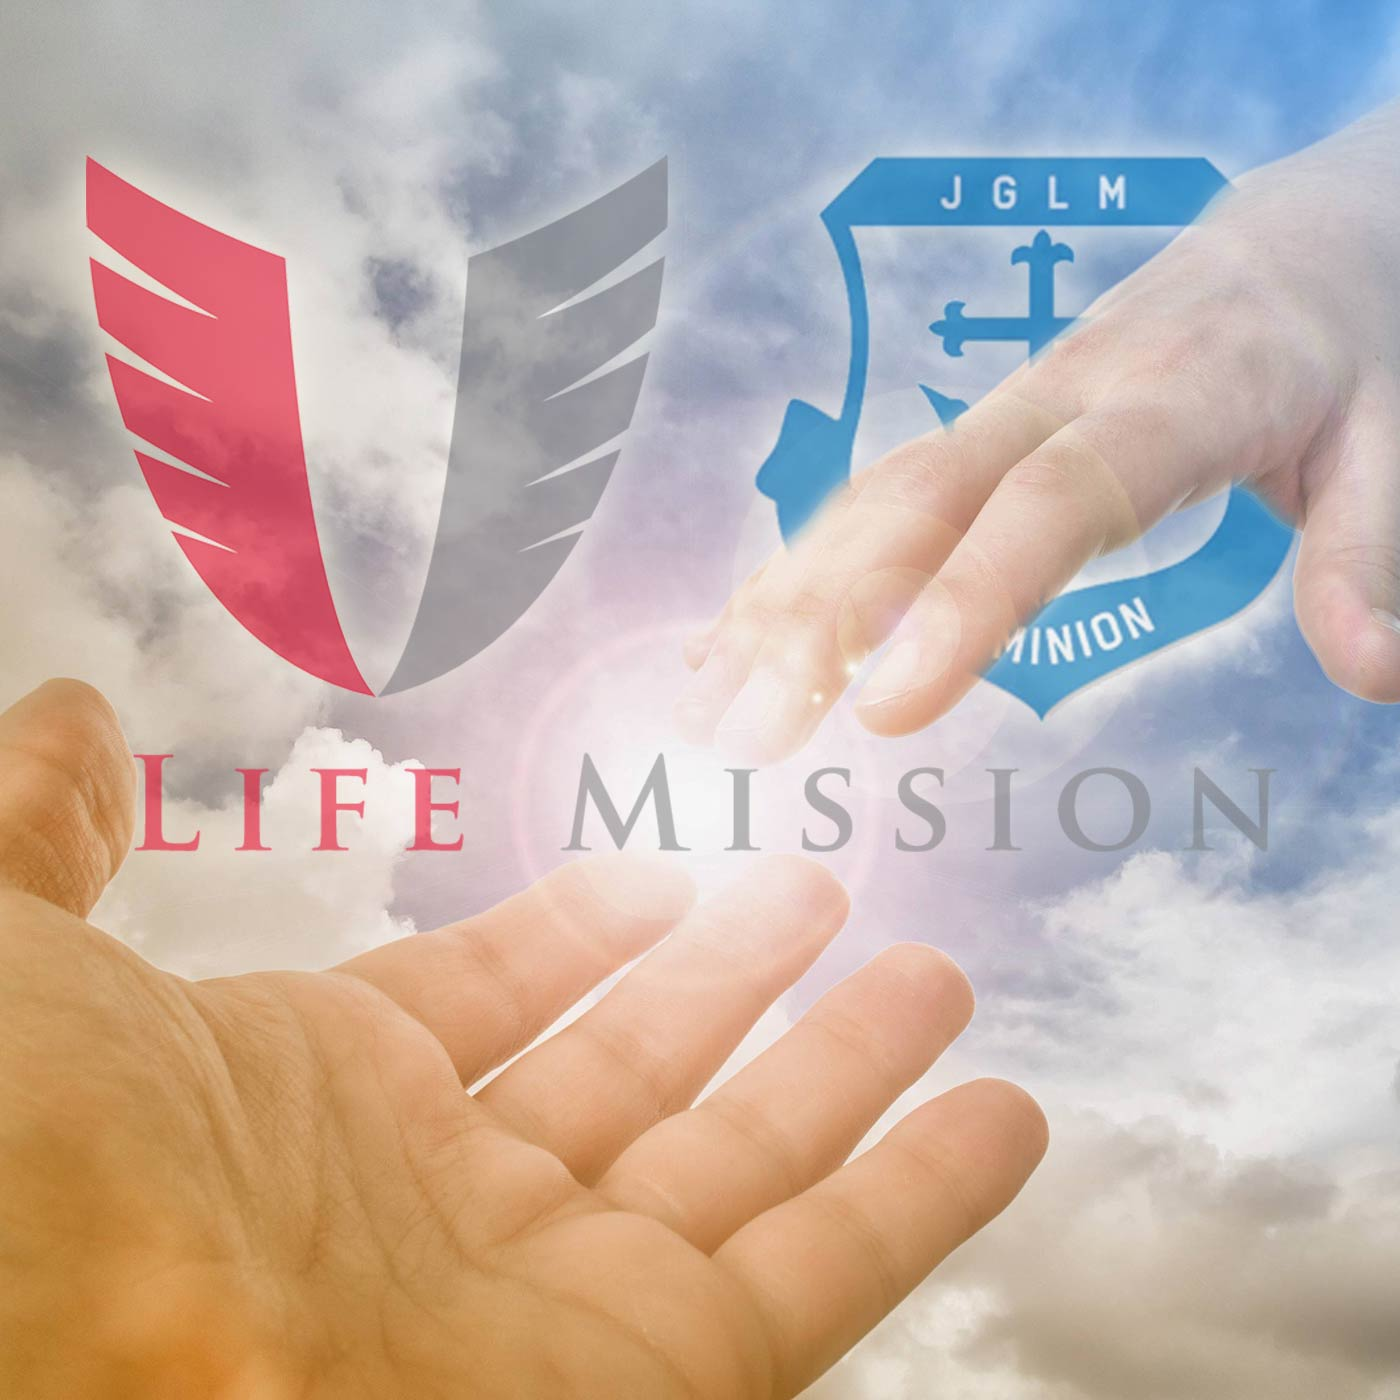 LIFE Mission, JGLM / DLIAC